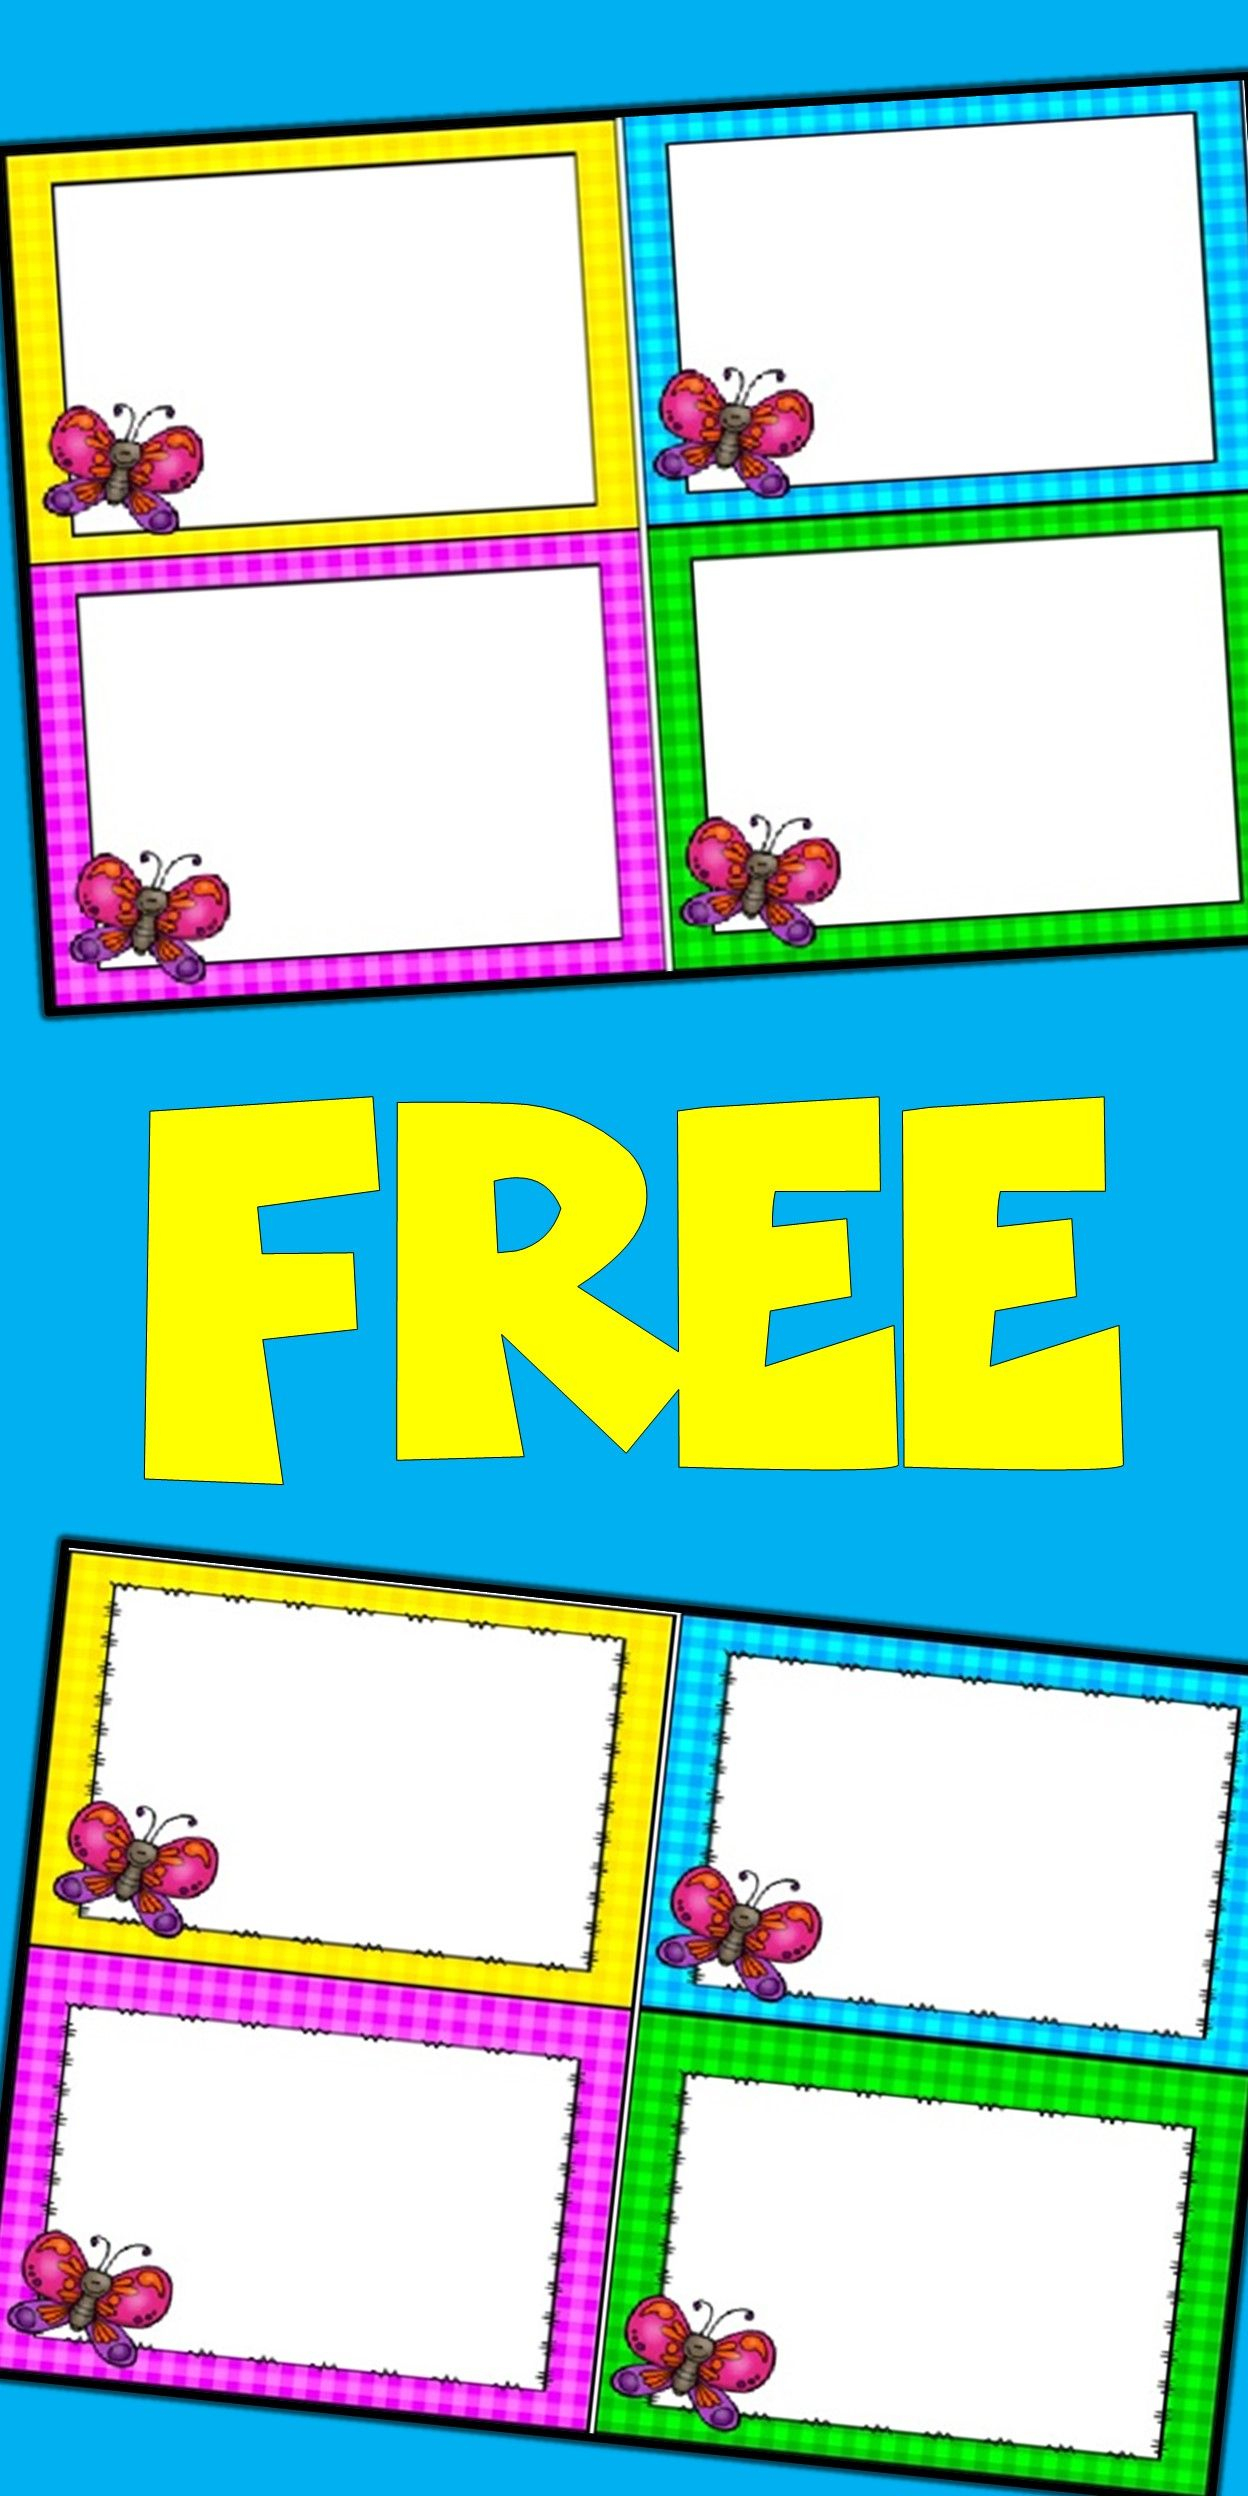 Free Editable Spring Card Templates | Butterflies | Pinterest - Free Printable Blank Task Cards